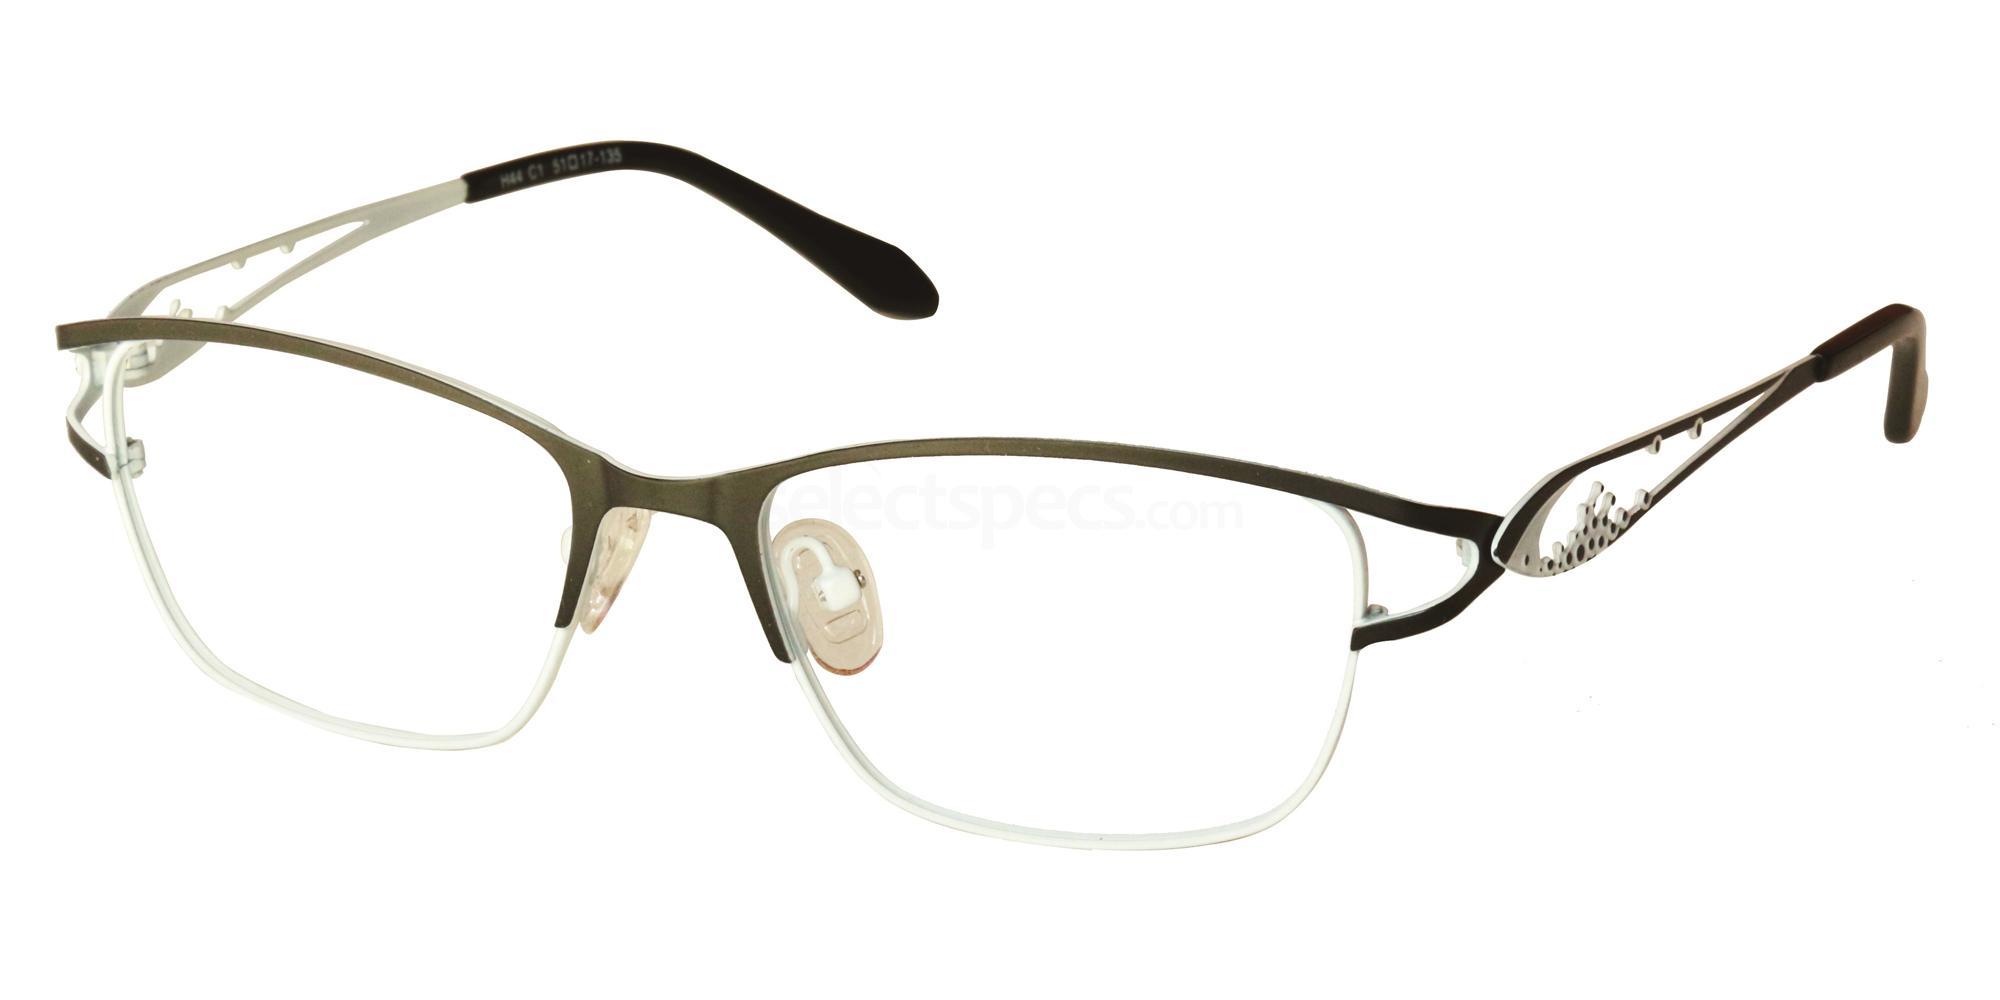 C1 H44 Glasses, Halstrom